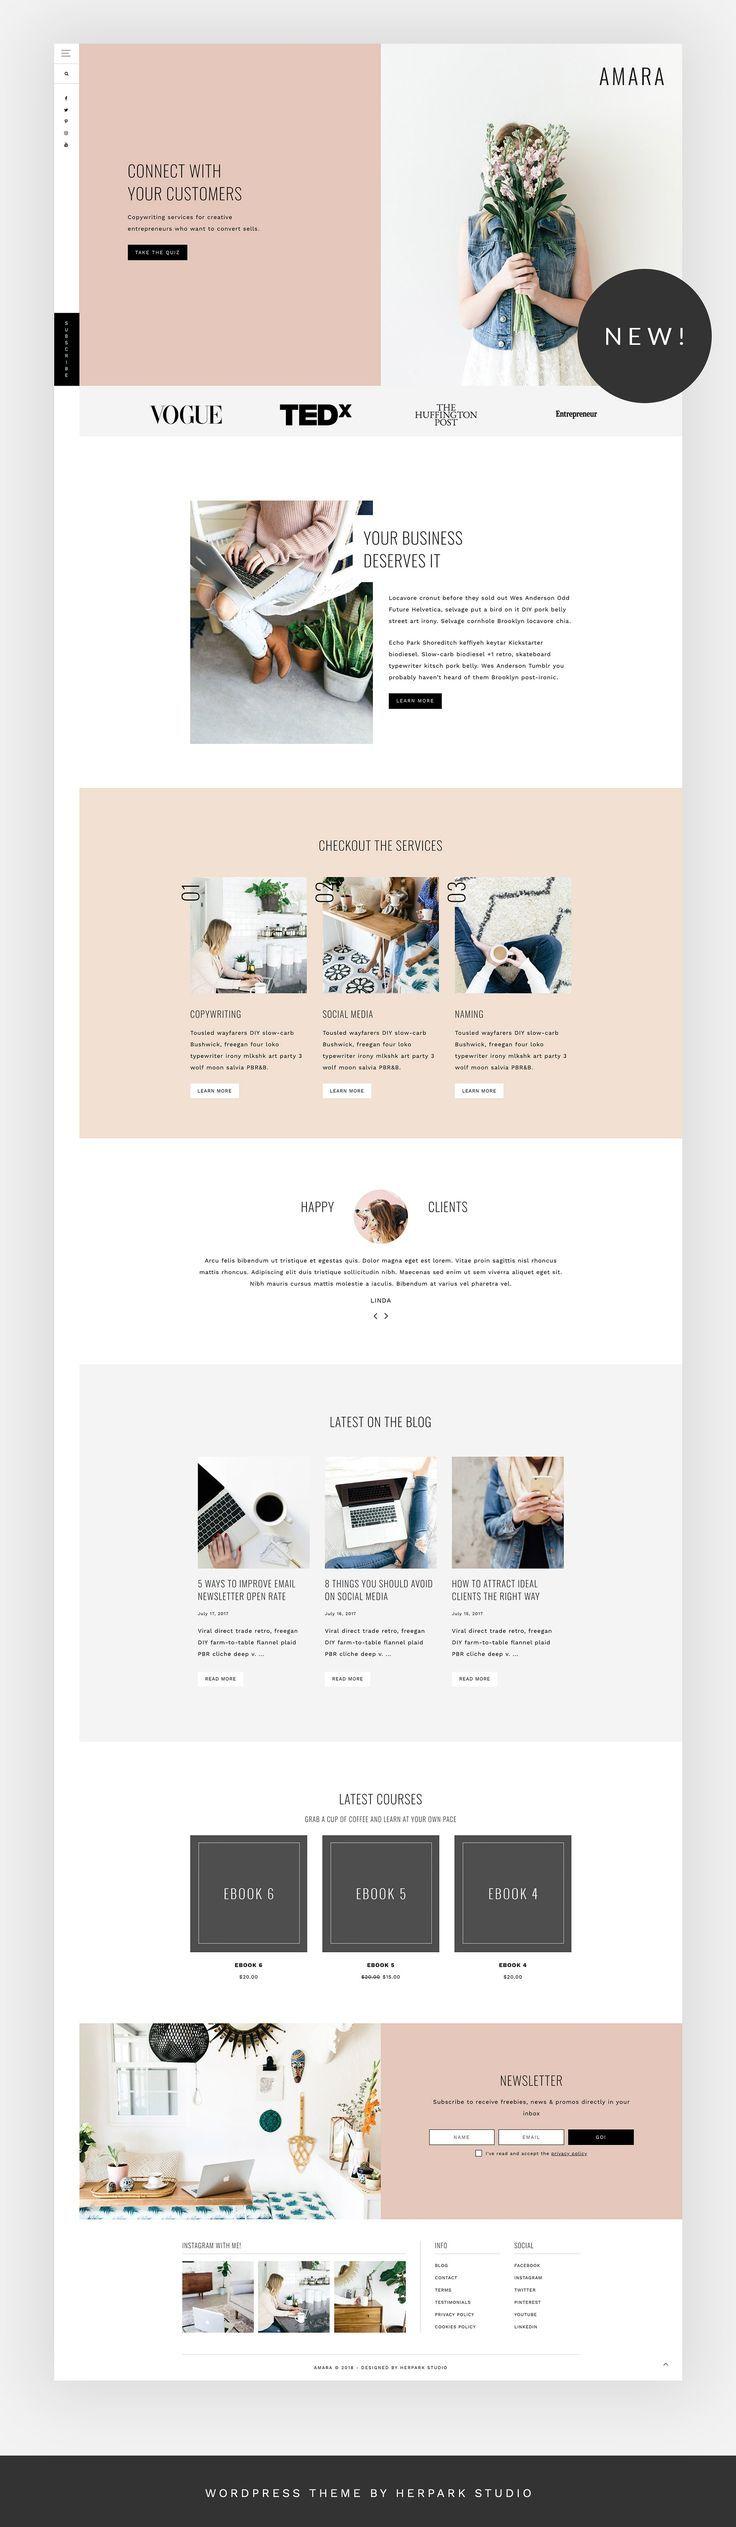 Amara A Theme For Entrepreneurs Genesis Child Themes Website Design Inspiration Feminine Wordpress Theme